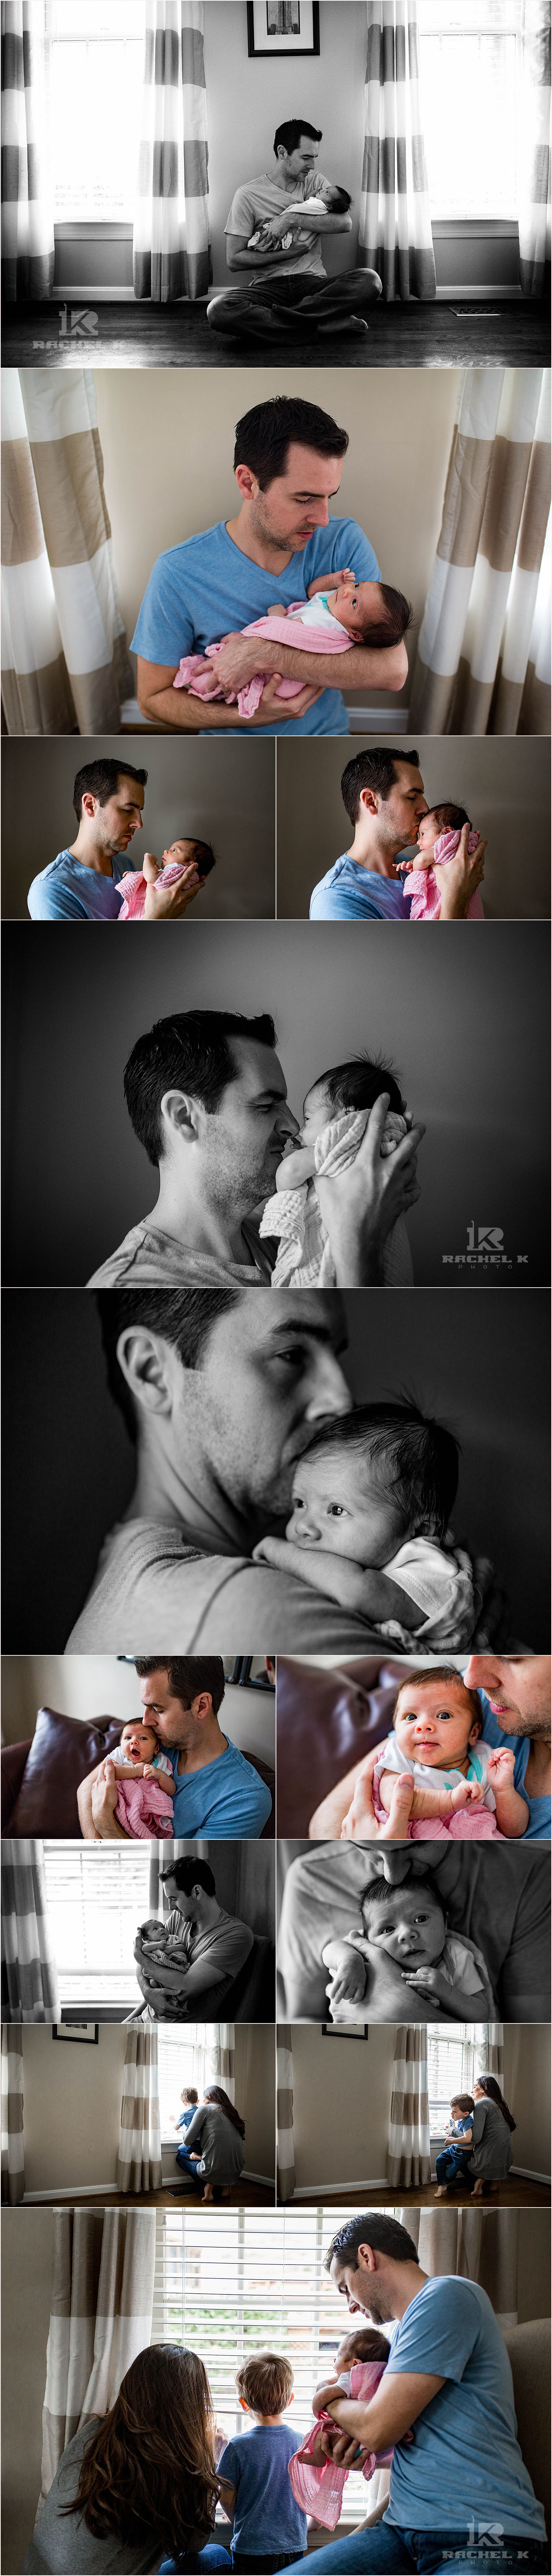 Newborn lifestyle photos by Rachel K Photo in Washington DC